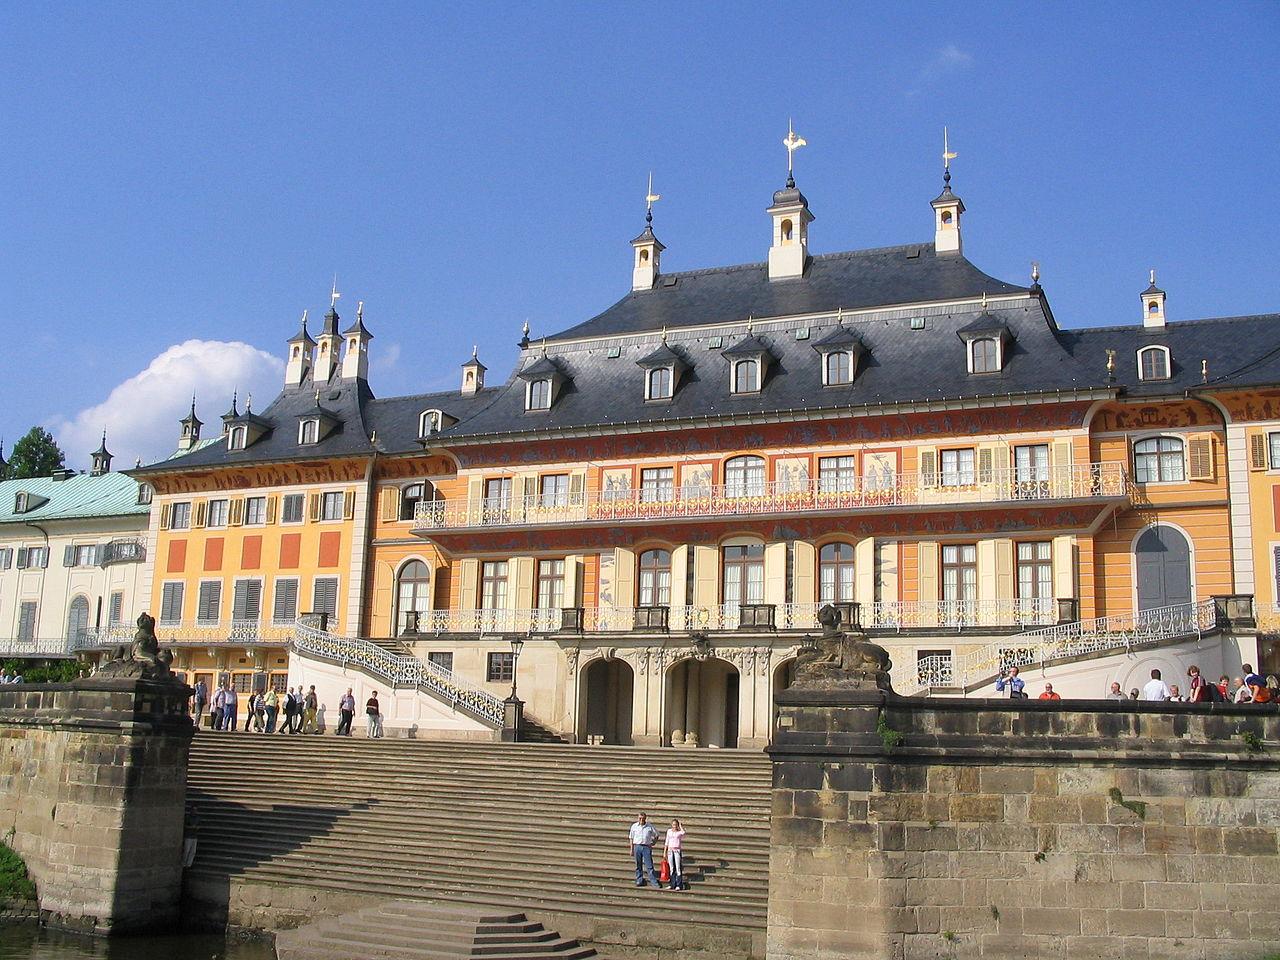 Замок Пильниц, Дрезден